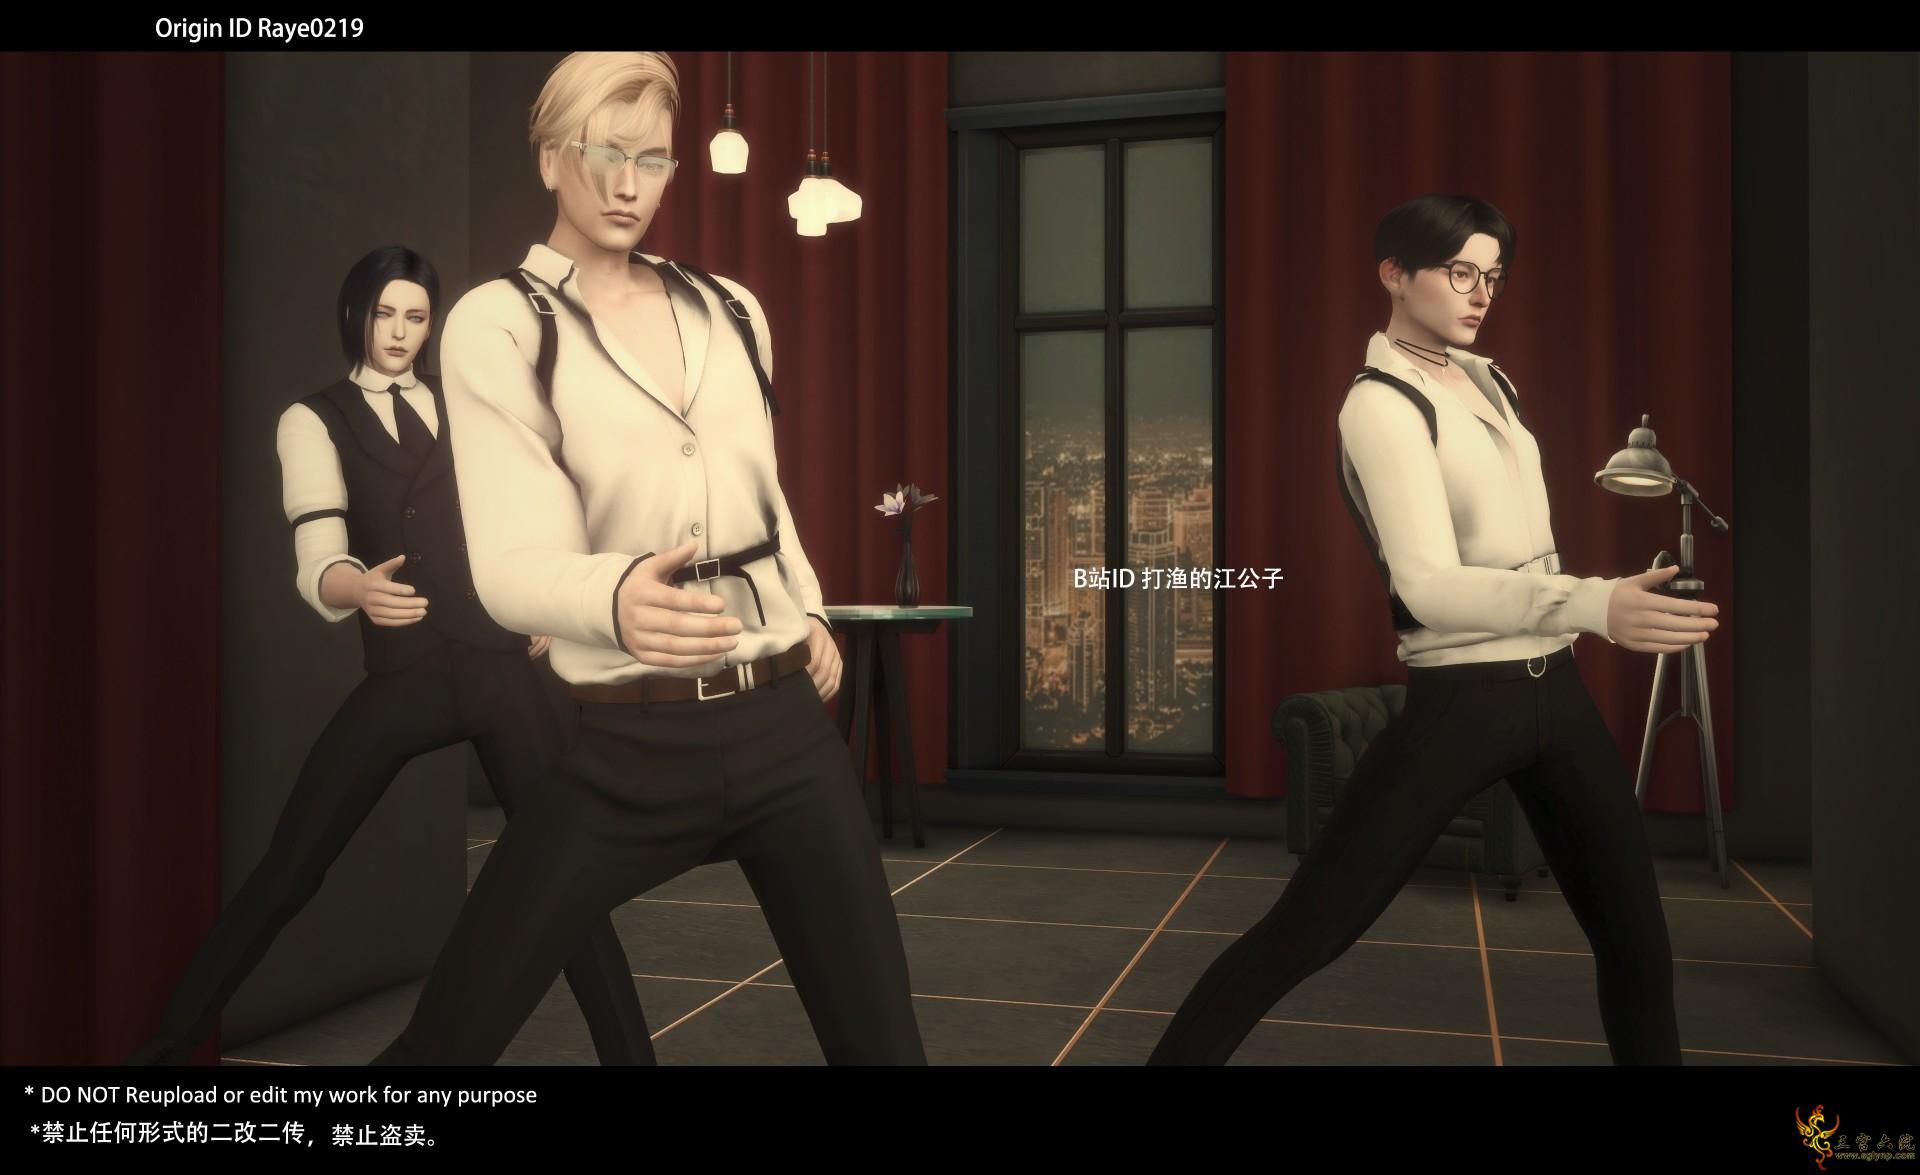 【R219】MMD Dance Pose Conqueror 03 .jpg